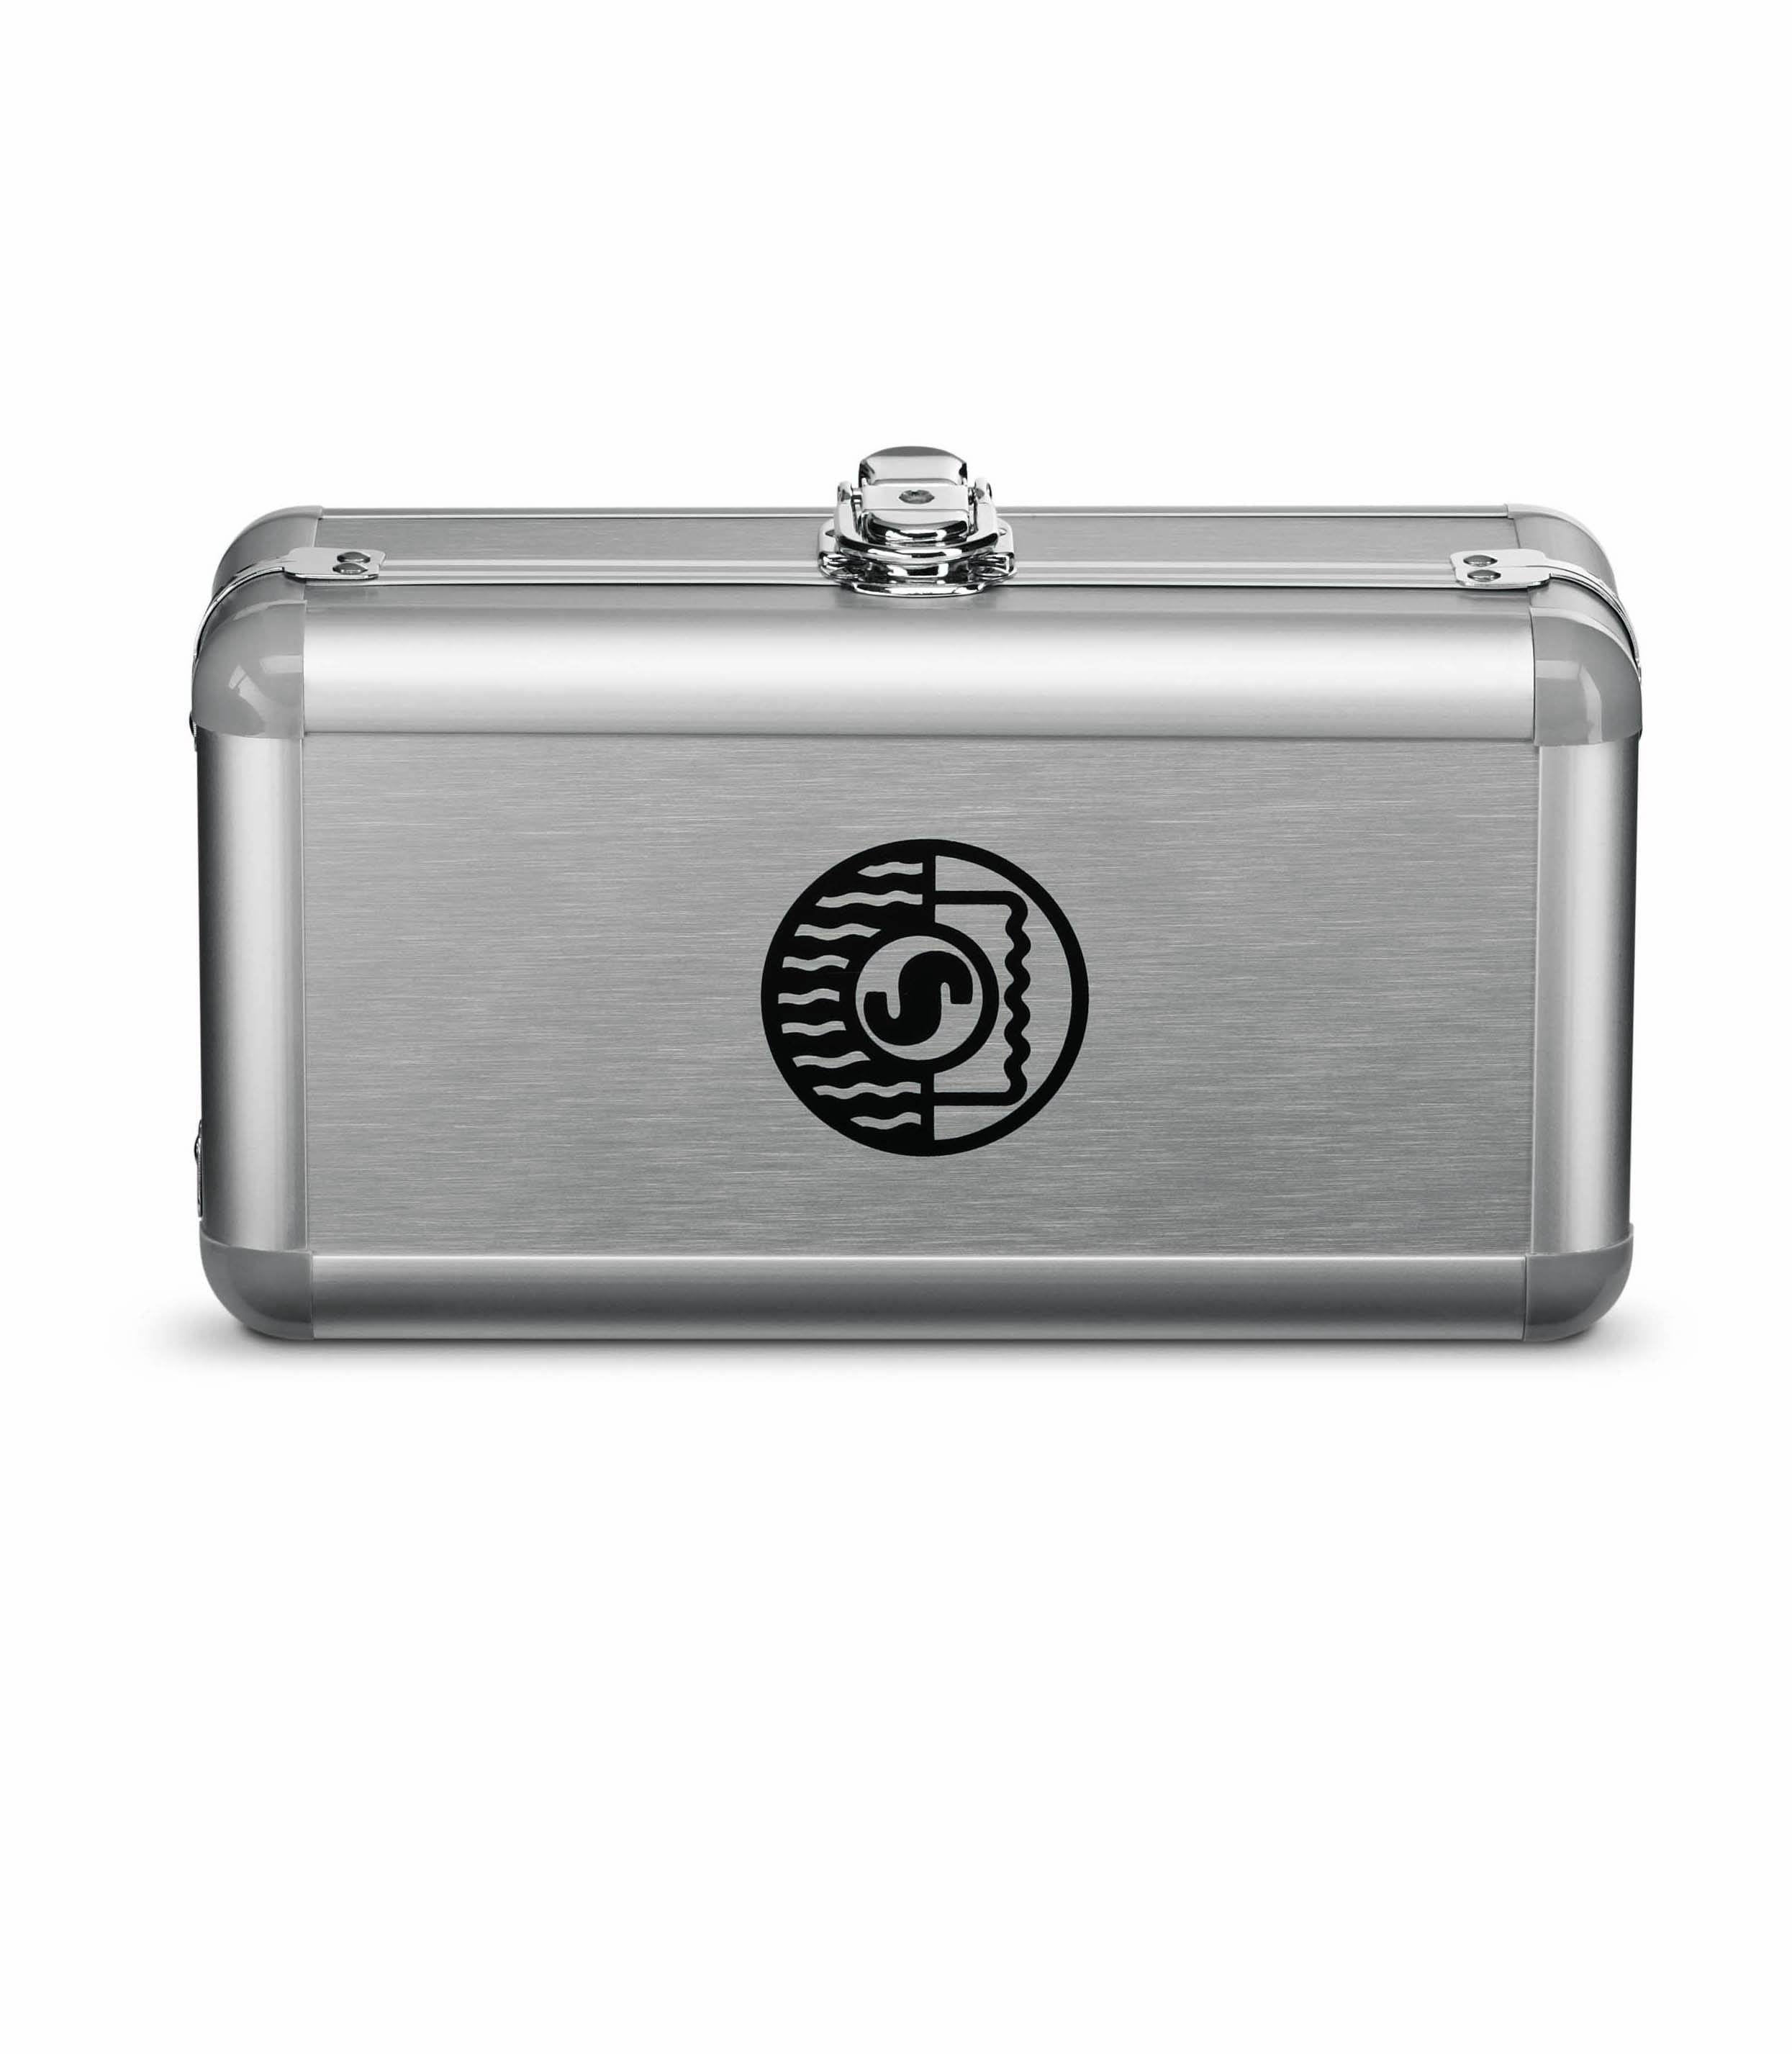 KSM9 CG MICROPHONE CHARCOAL GRAY - Buy Online